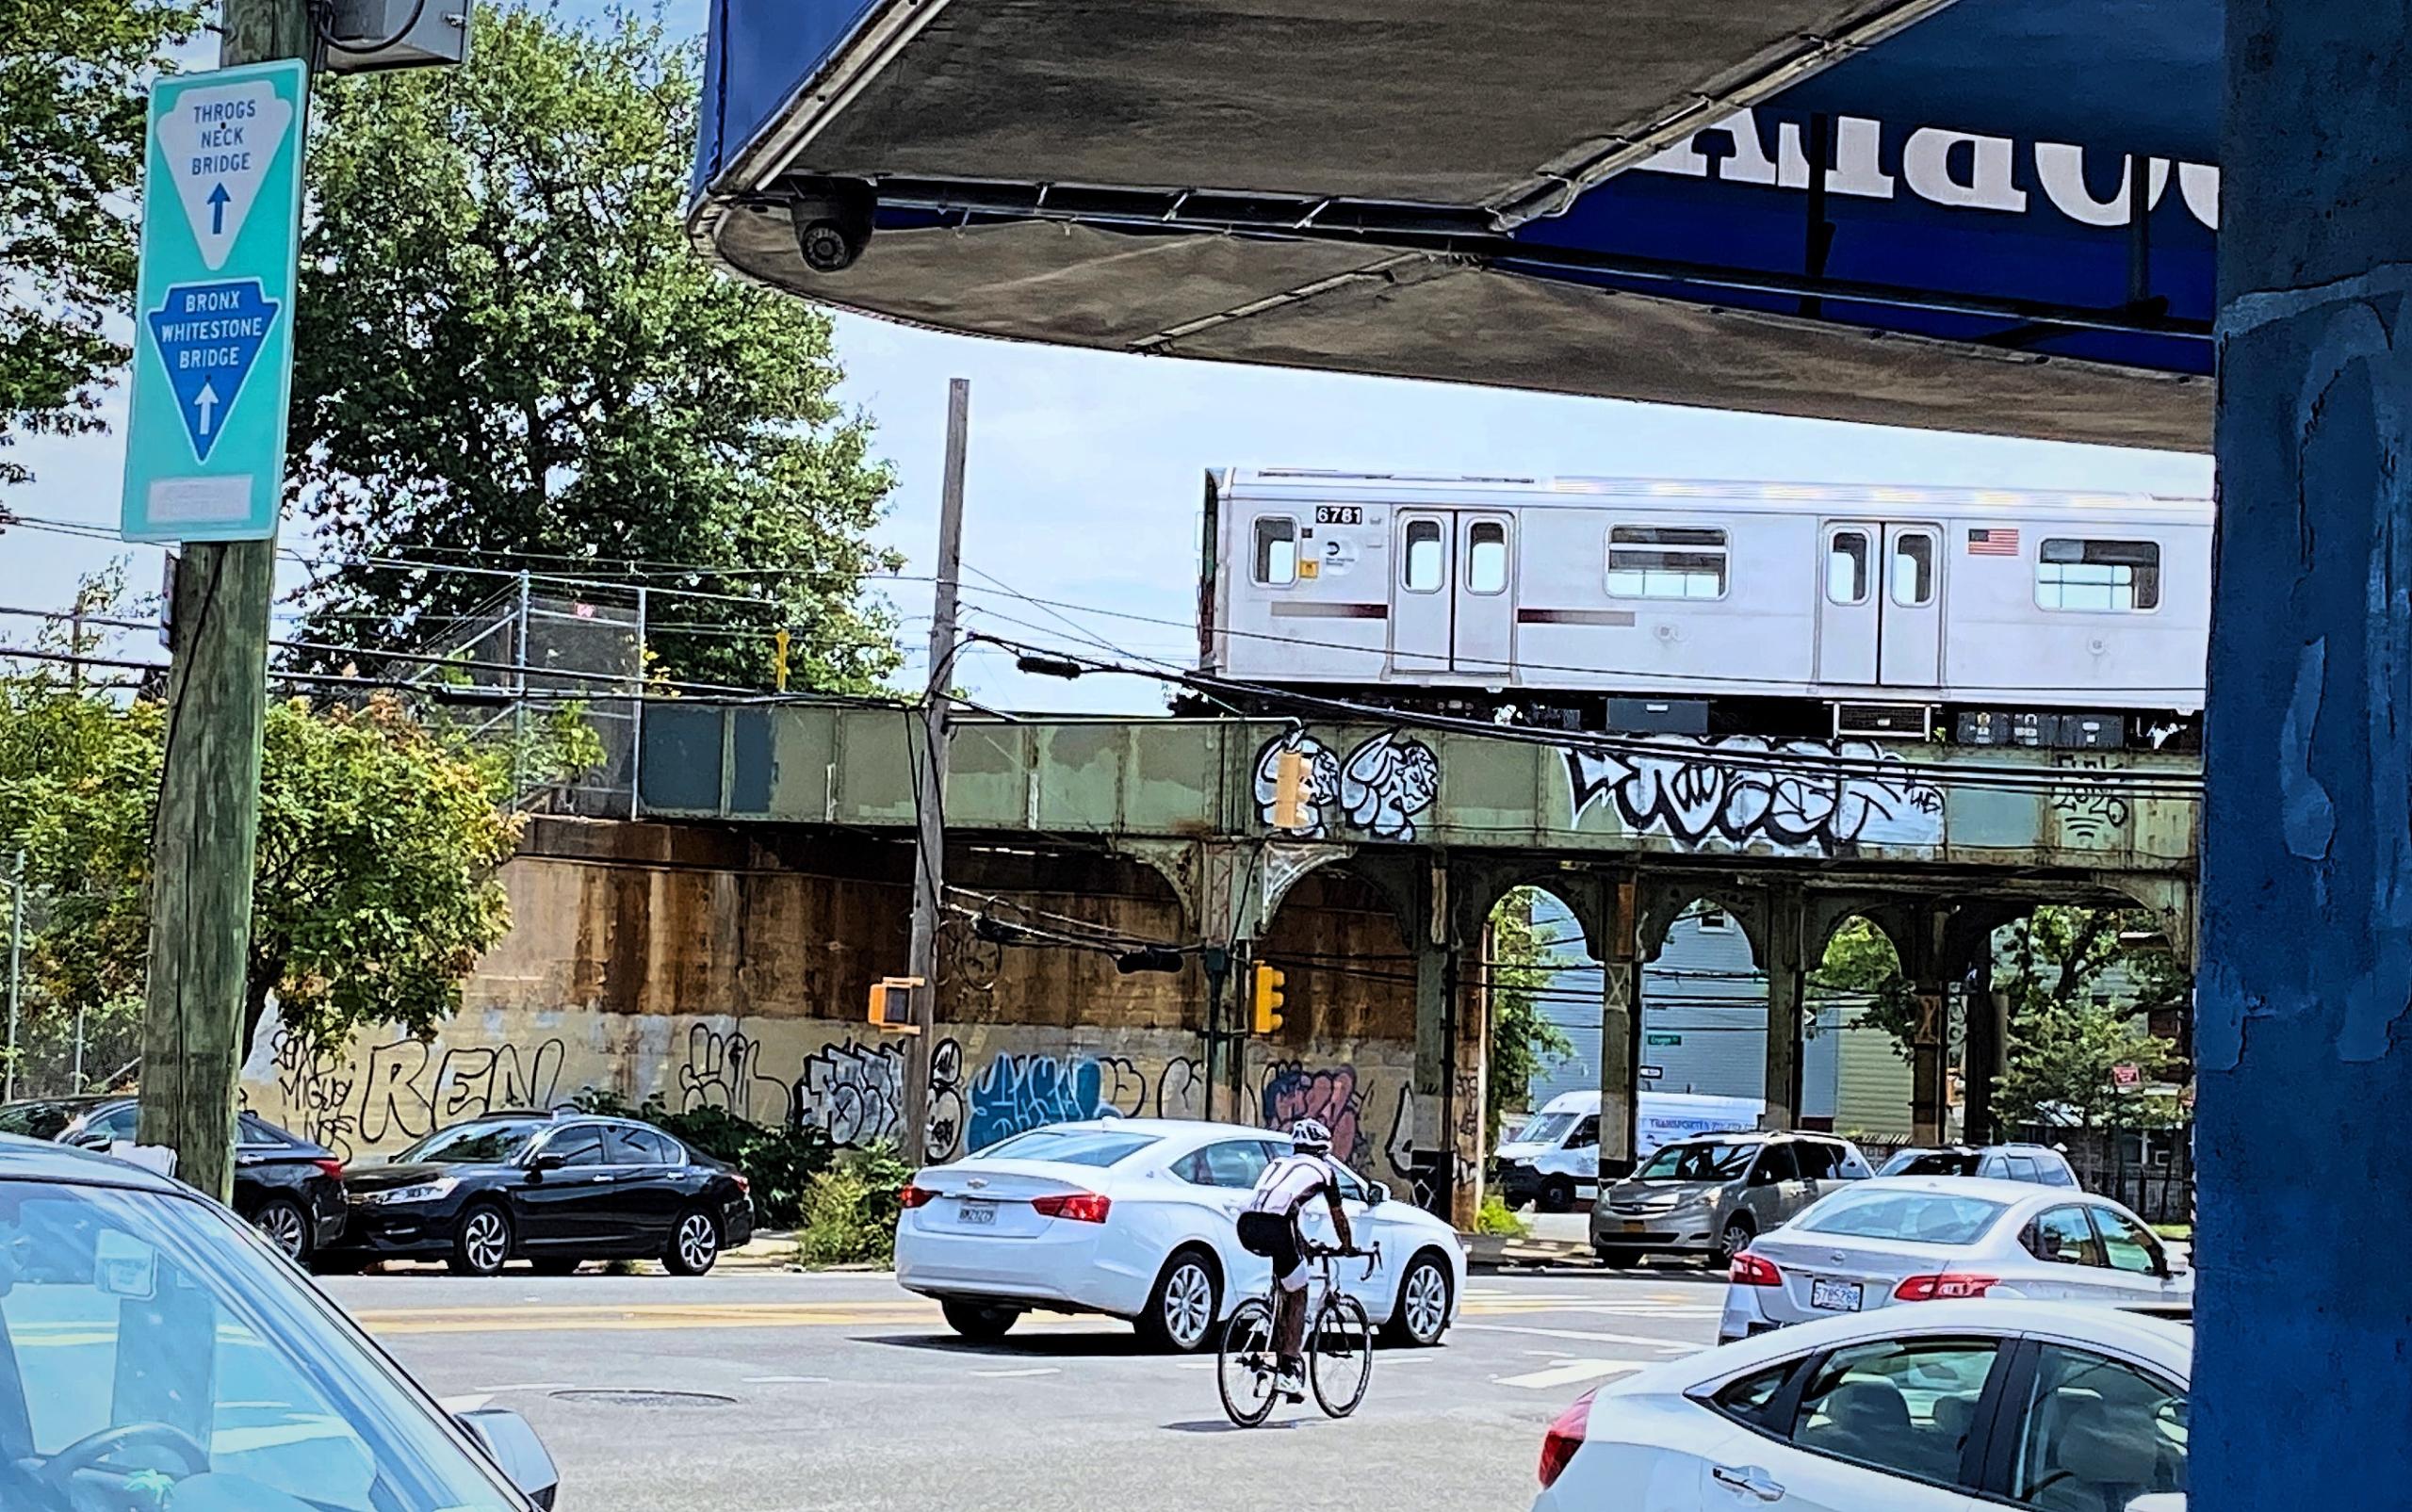 Biking in the Bronx